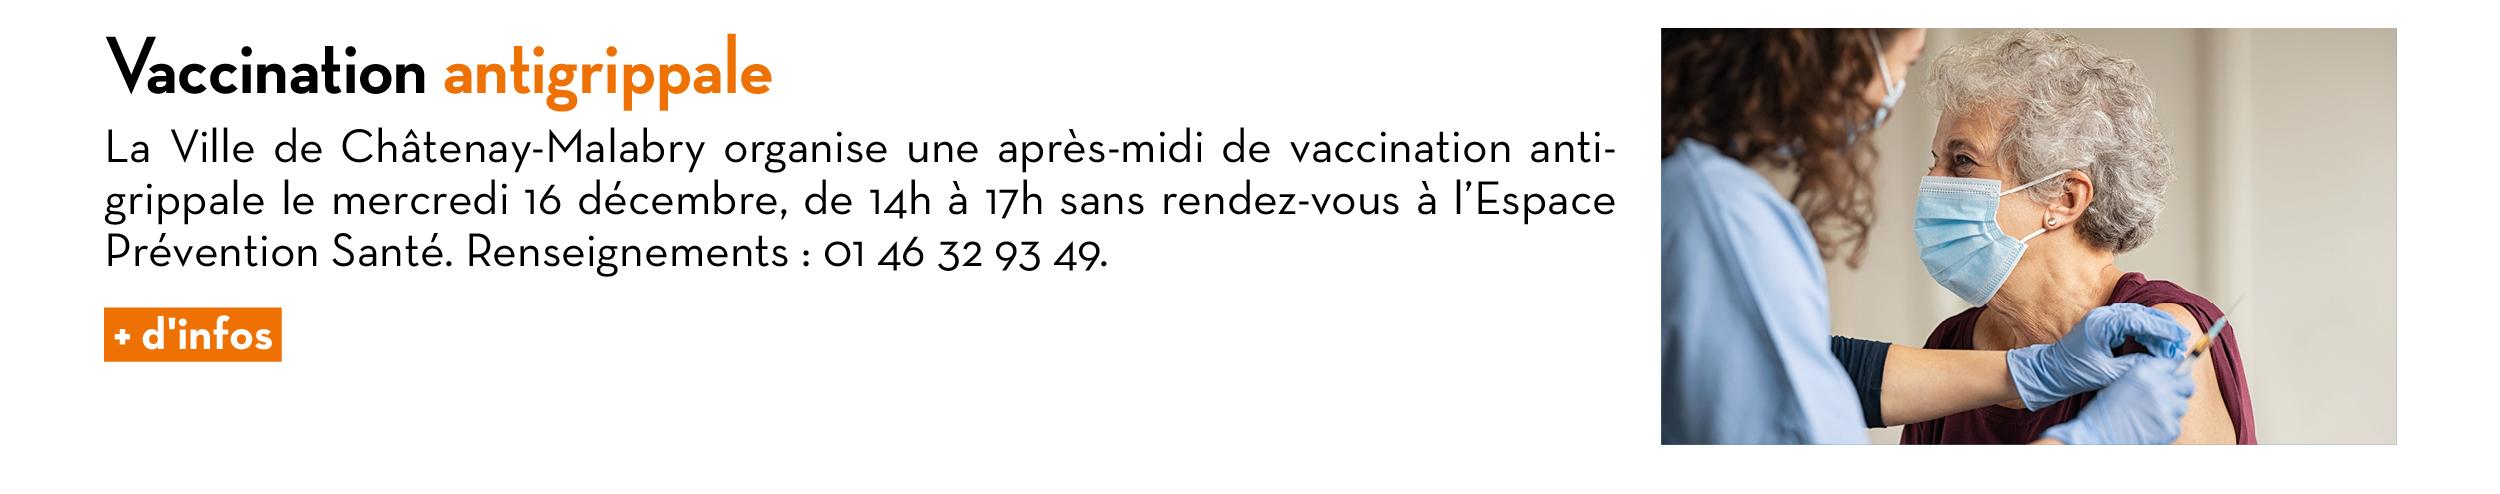 Vaccination antigrippale